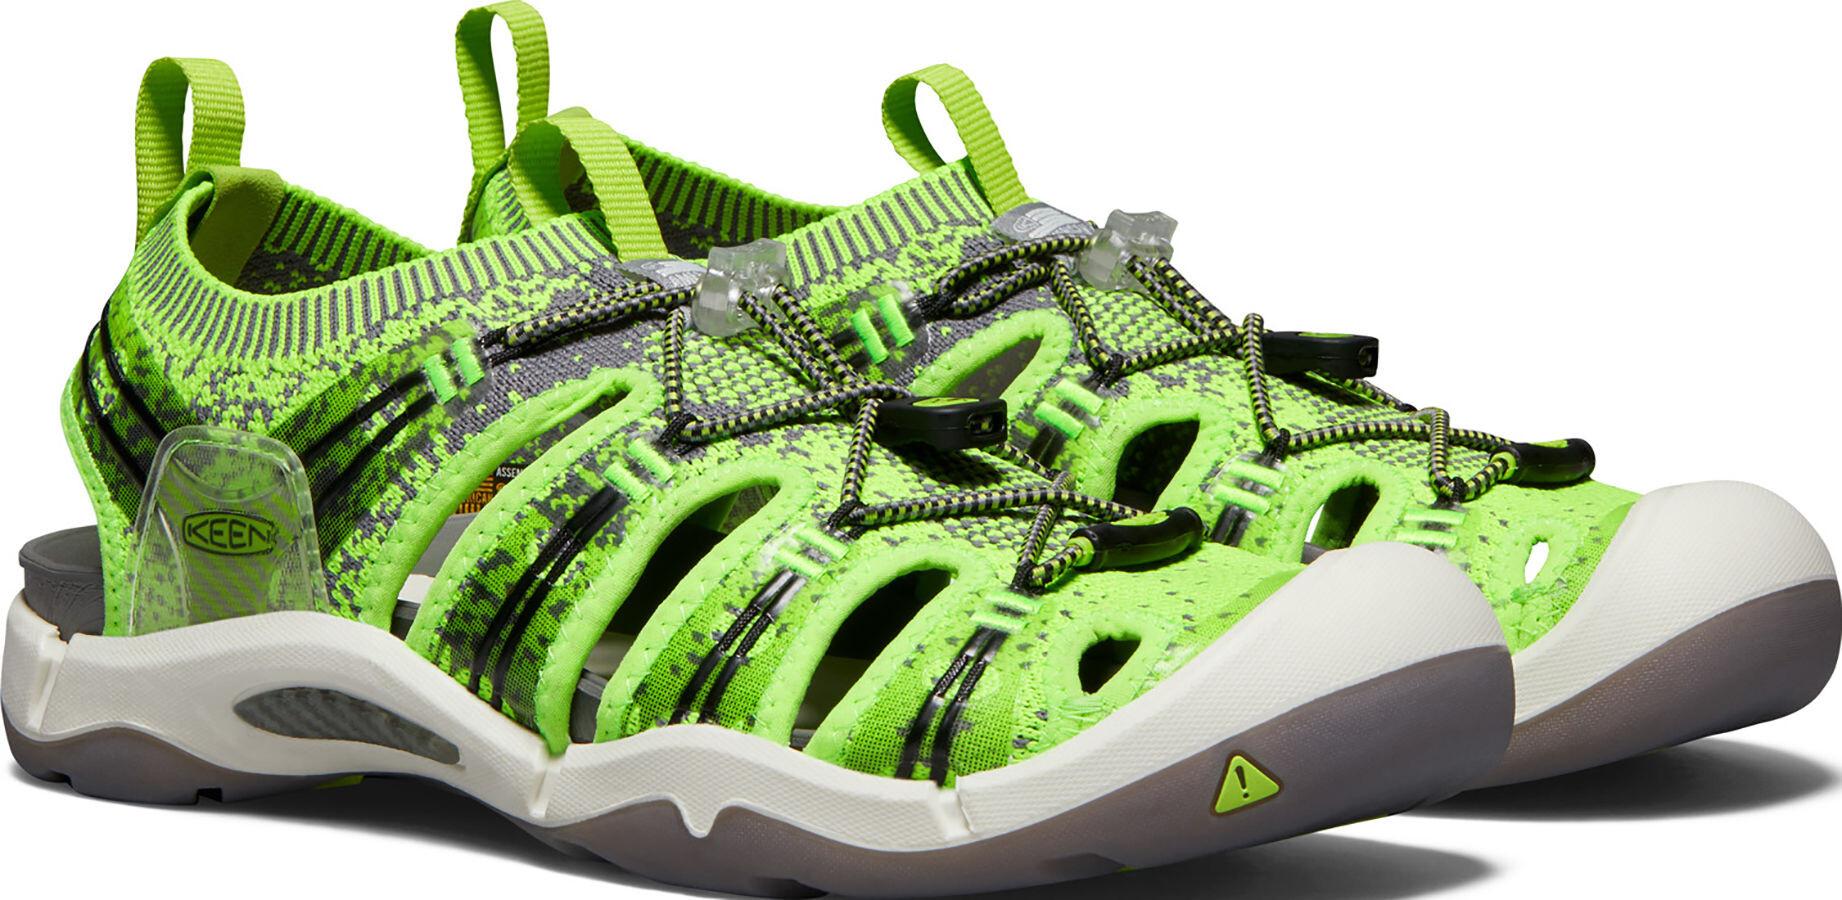 657bd9ee7102 Keen Evofit One Sandals Men green at Addnature.co.uk